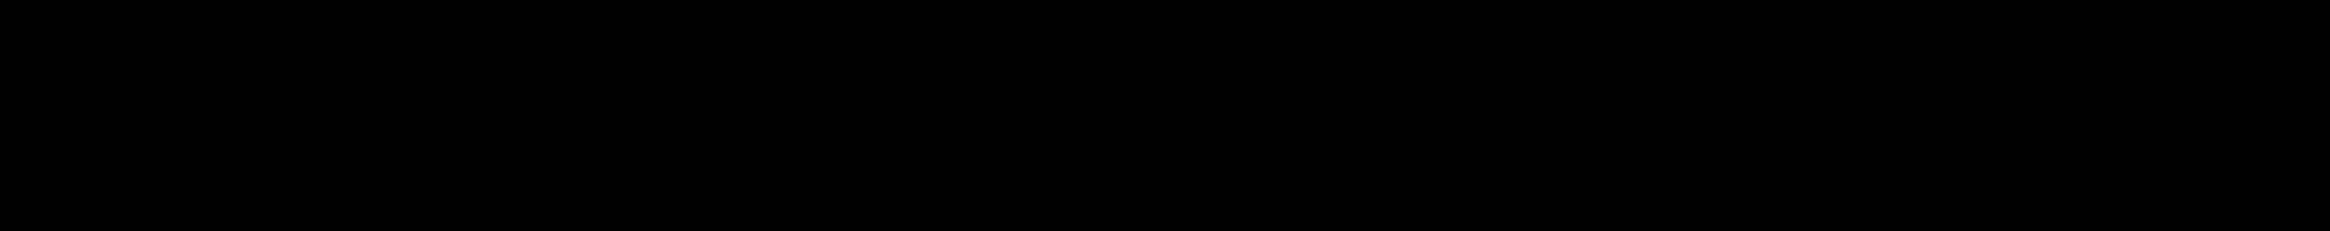 Blue Goblet Drawn Normal Thin Italic